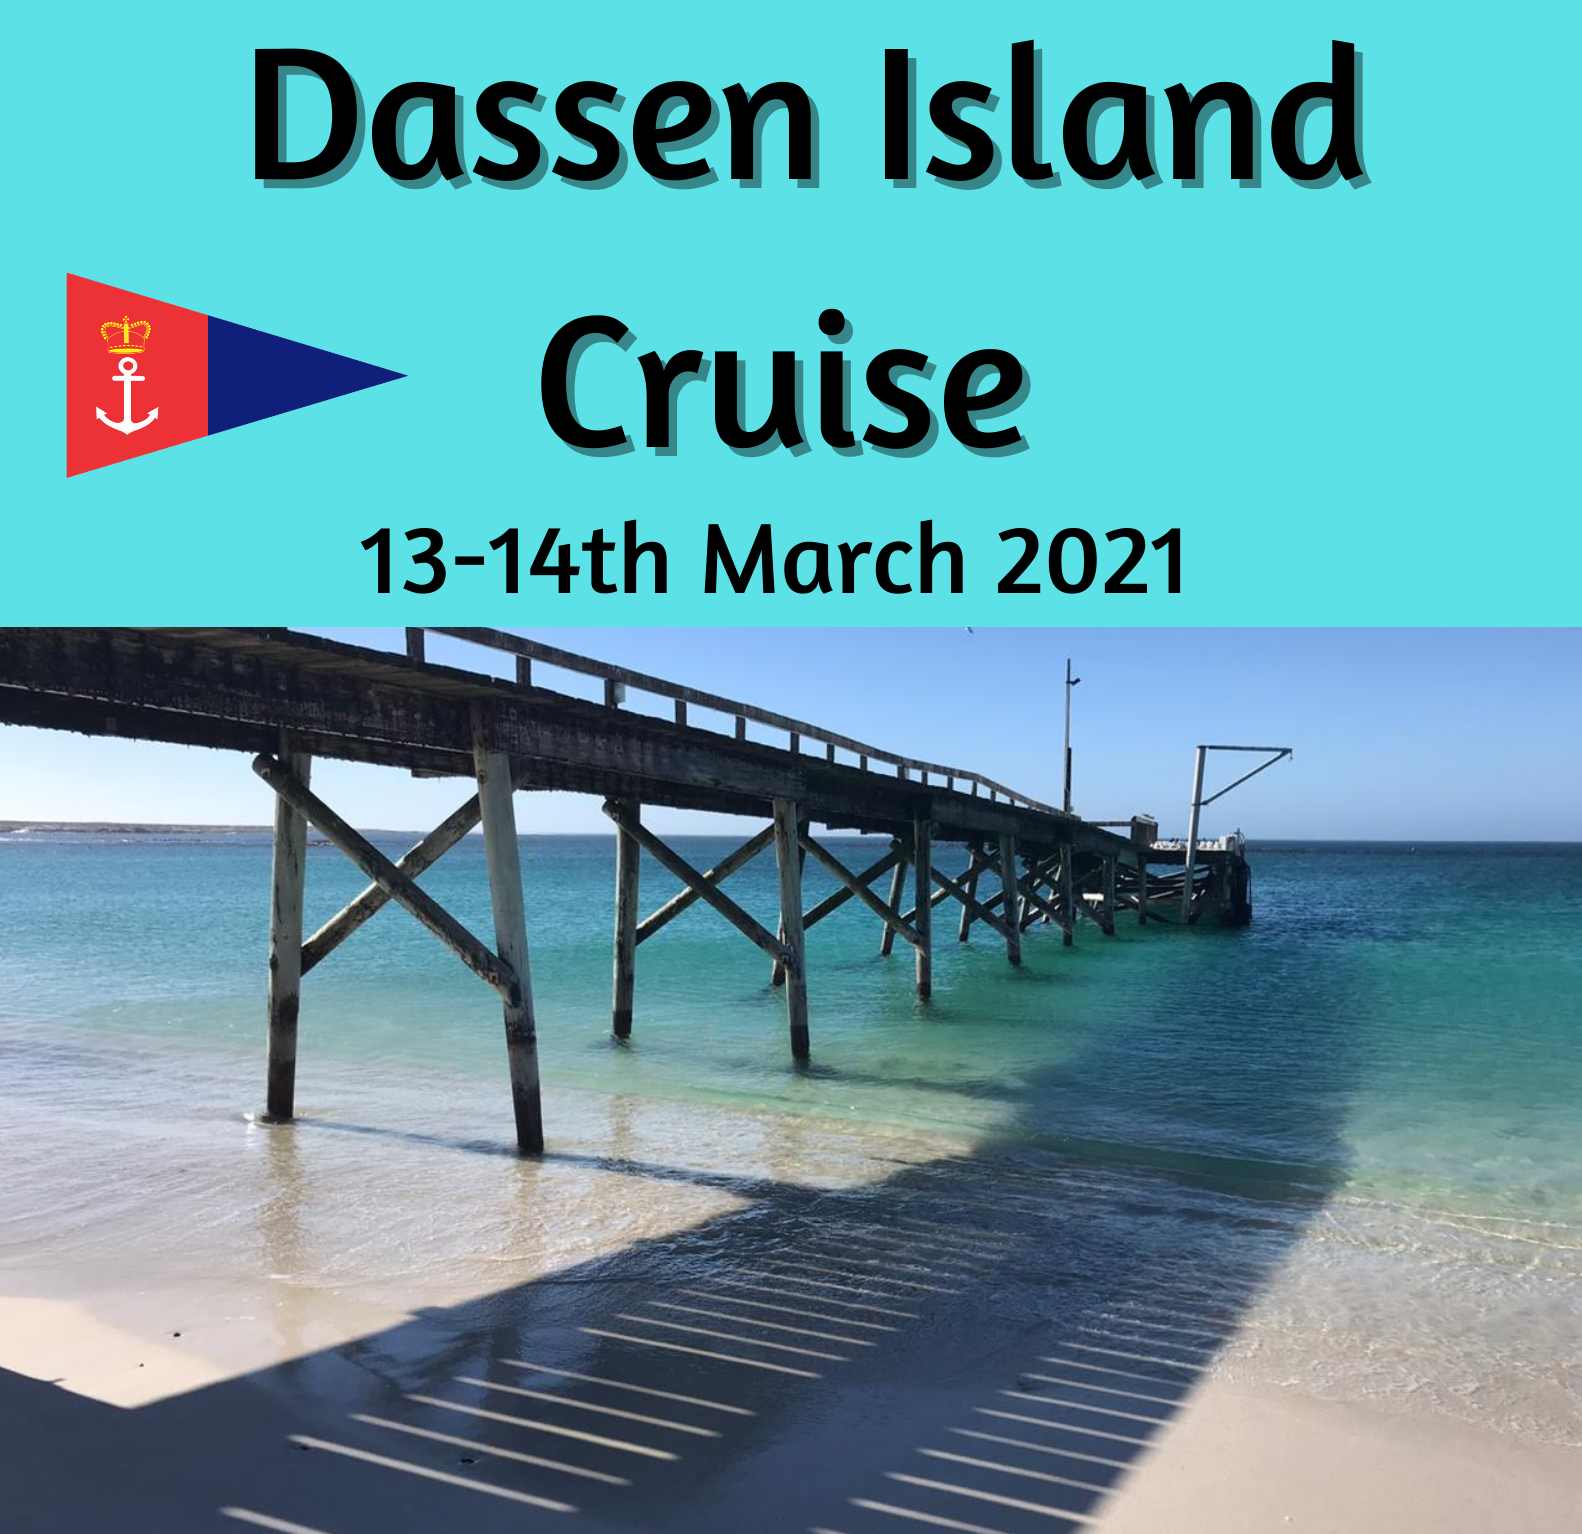 Dassen Island Cruise  – Postponed